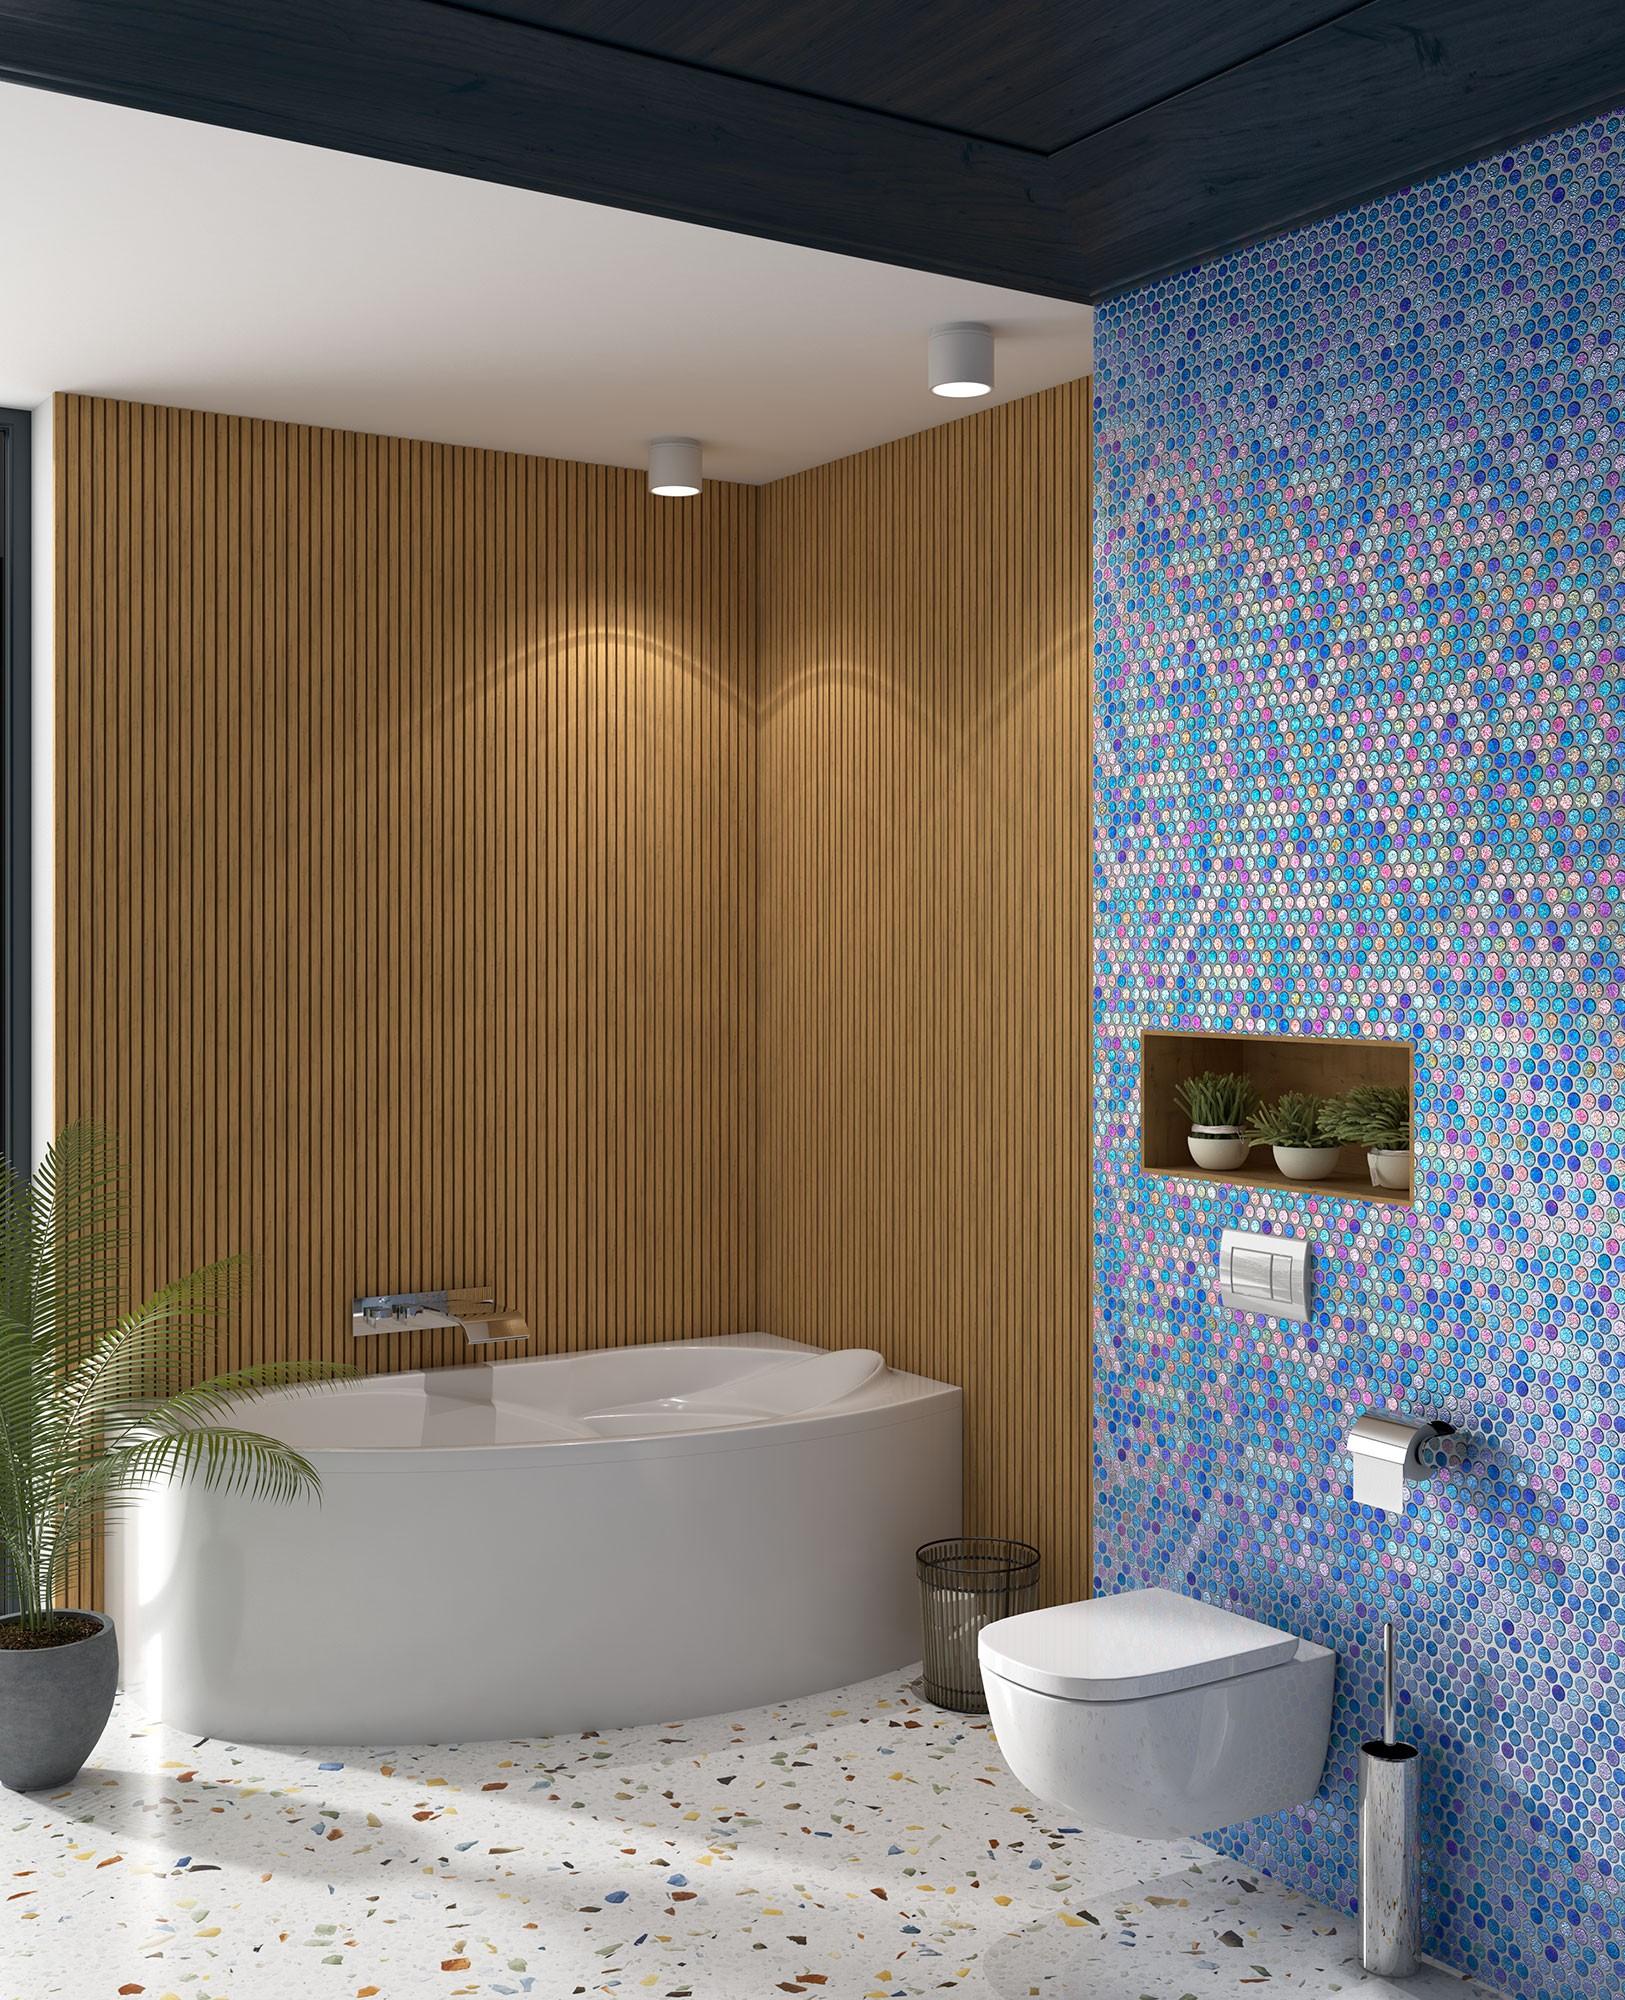 555c Circle Final - Mosaico Interior: Tendencia En Decoración - Decoración